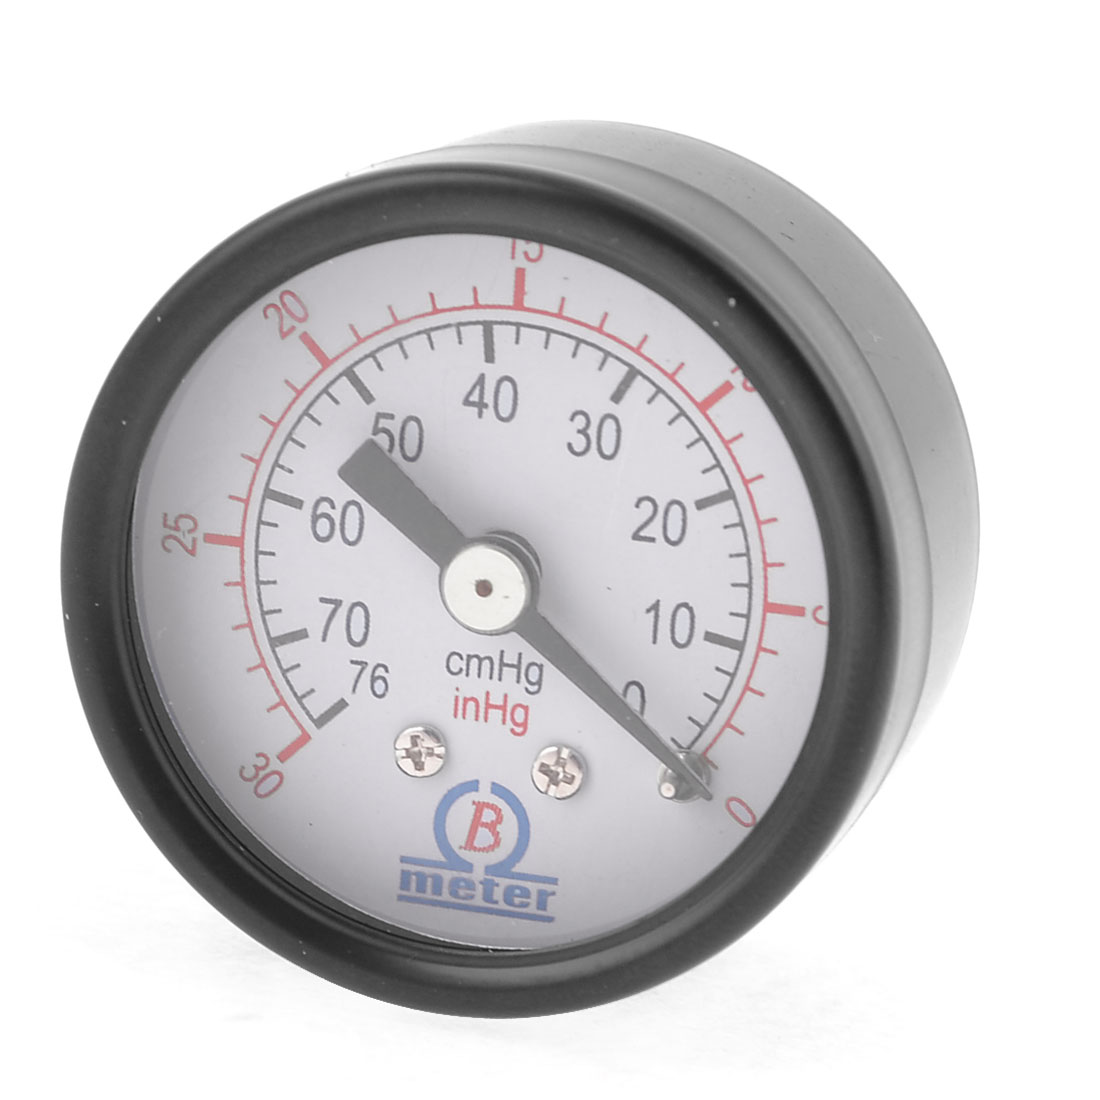 "Air Compressor 1/8""PT Male Thread 0-76cmHg 0-30inHg Pressure Gauge"